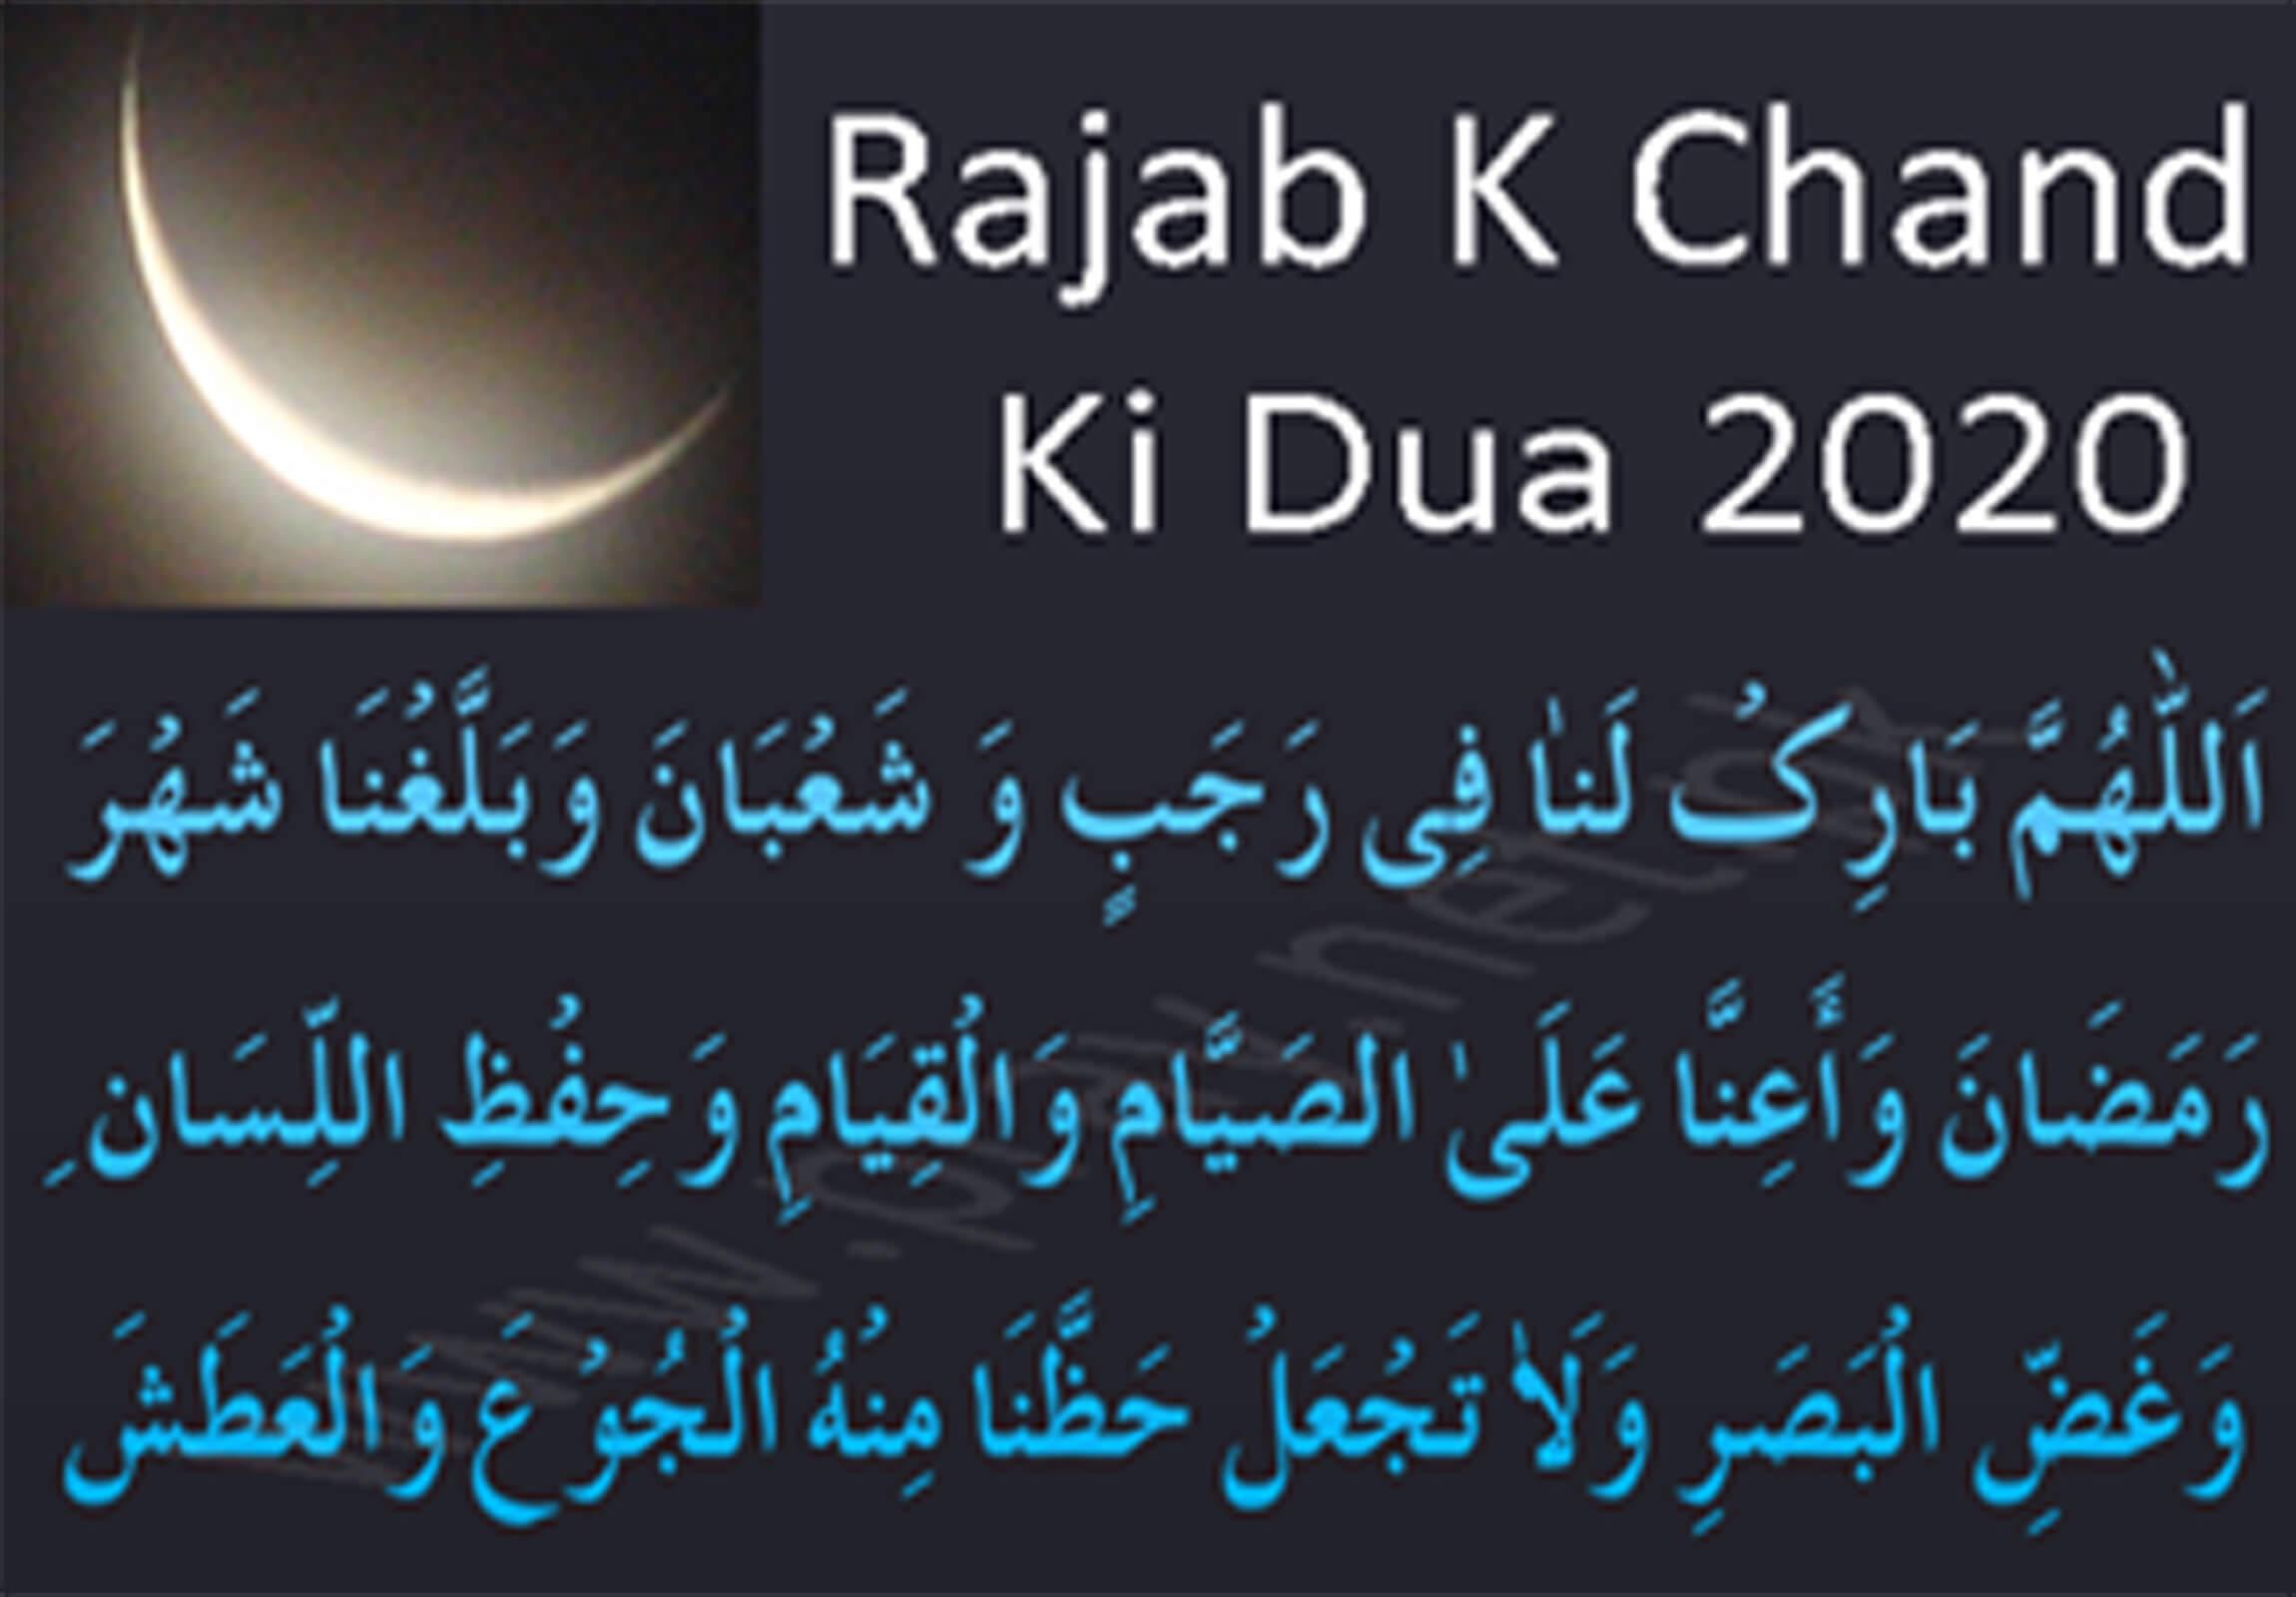 Rajab K Chand Ka wazifa 2020